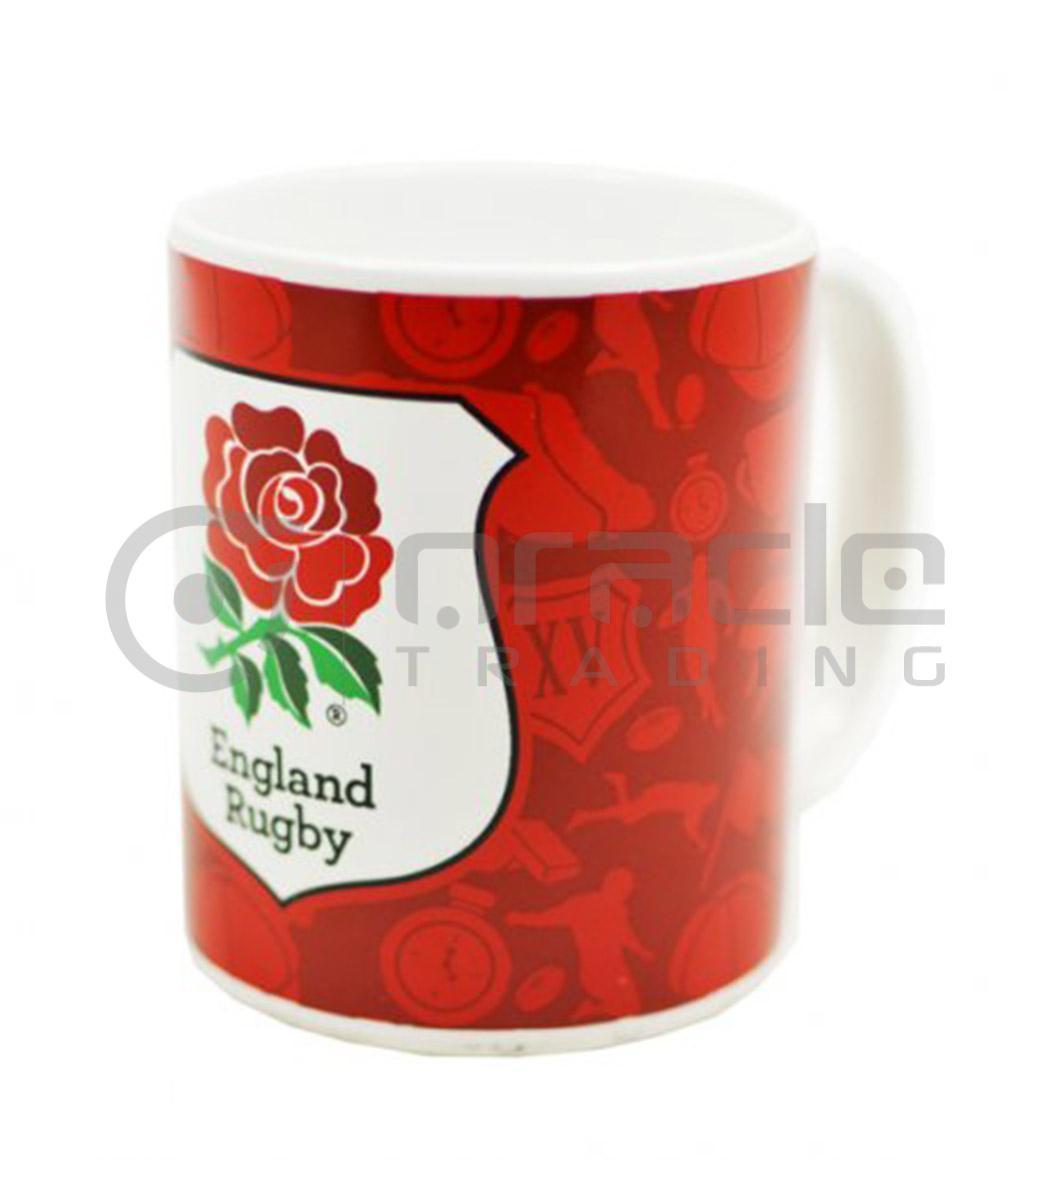 England Rugby Mug - Crest